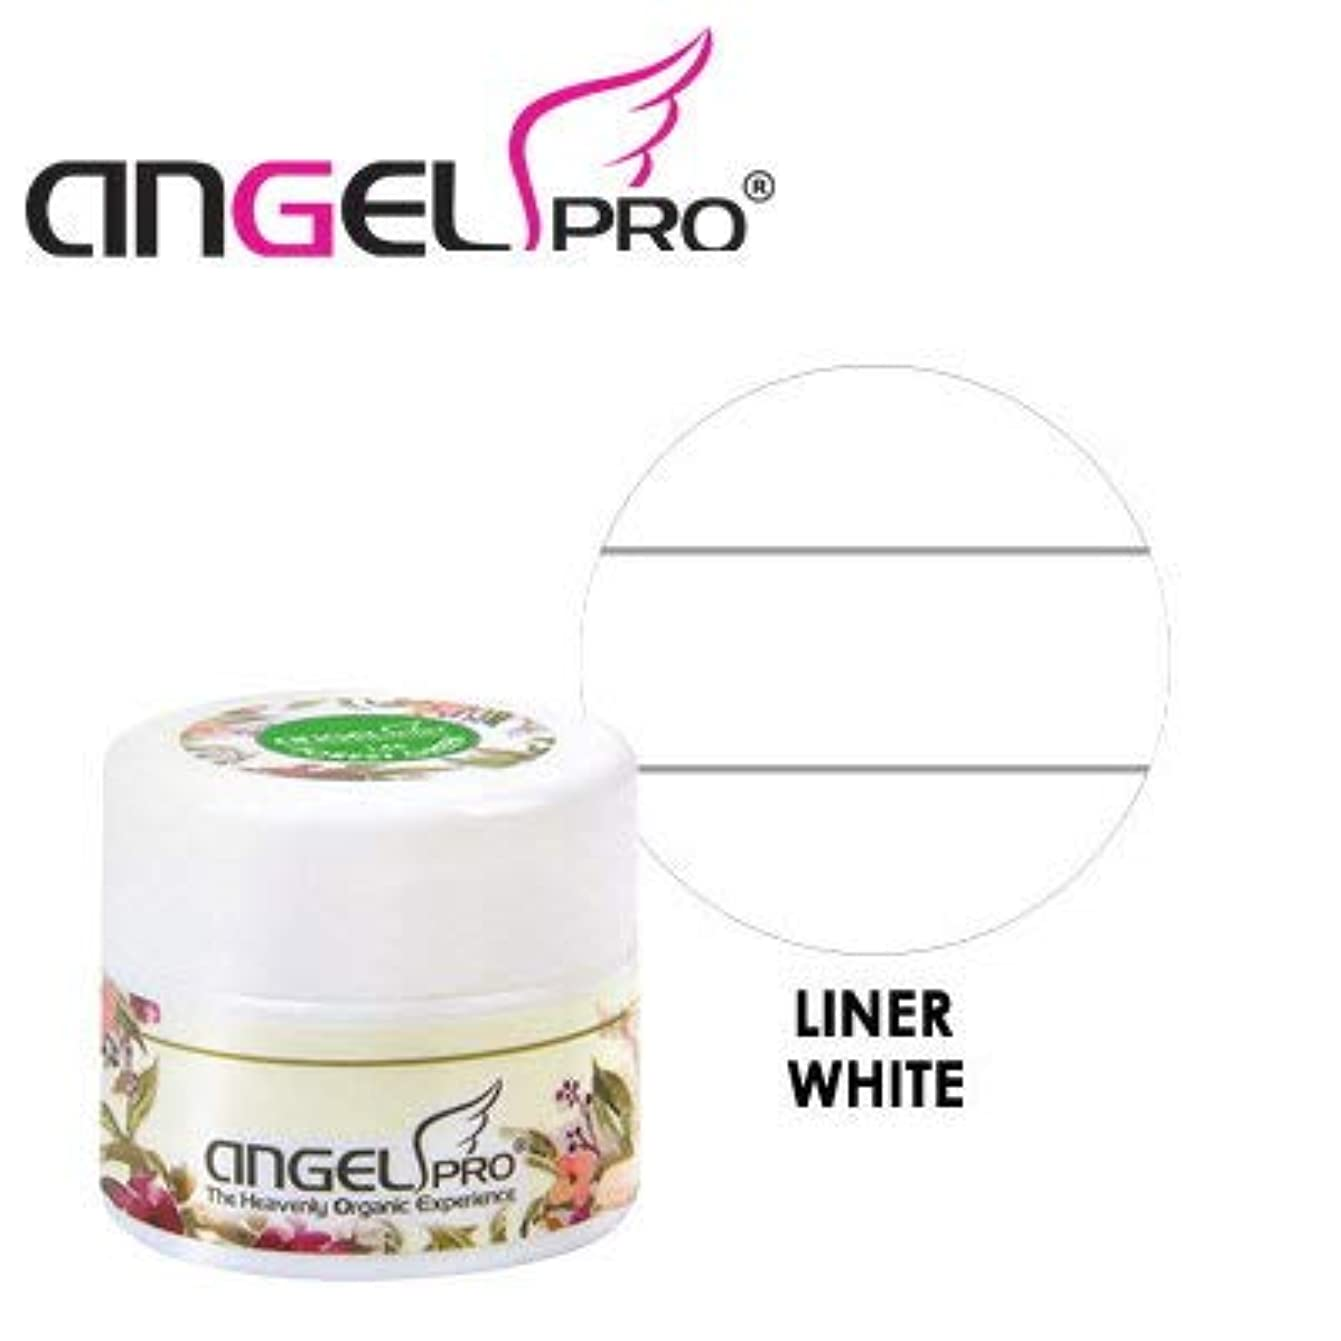 ANGEL PRO ポットジェリー LINER WHITE 4g